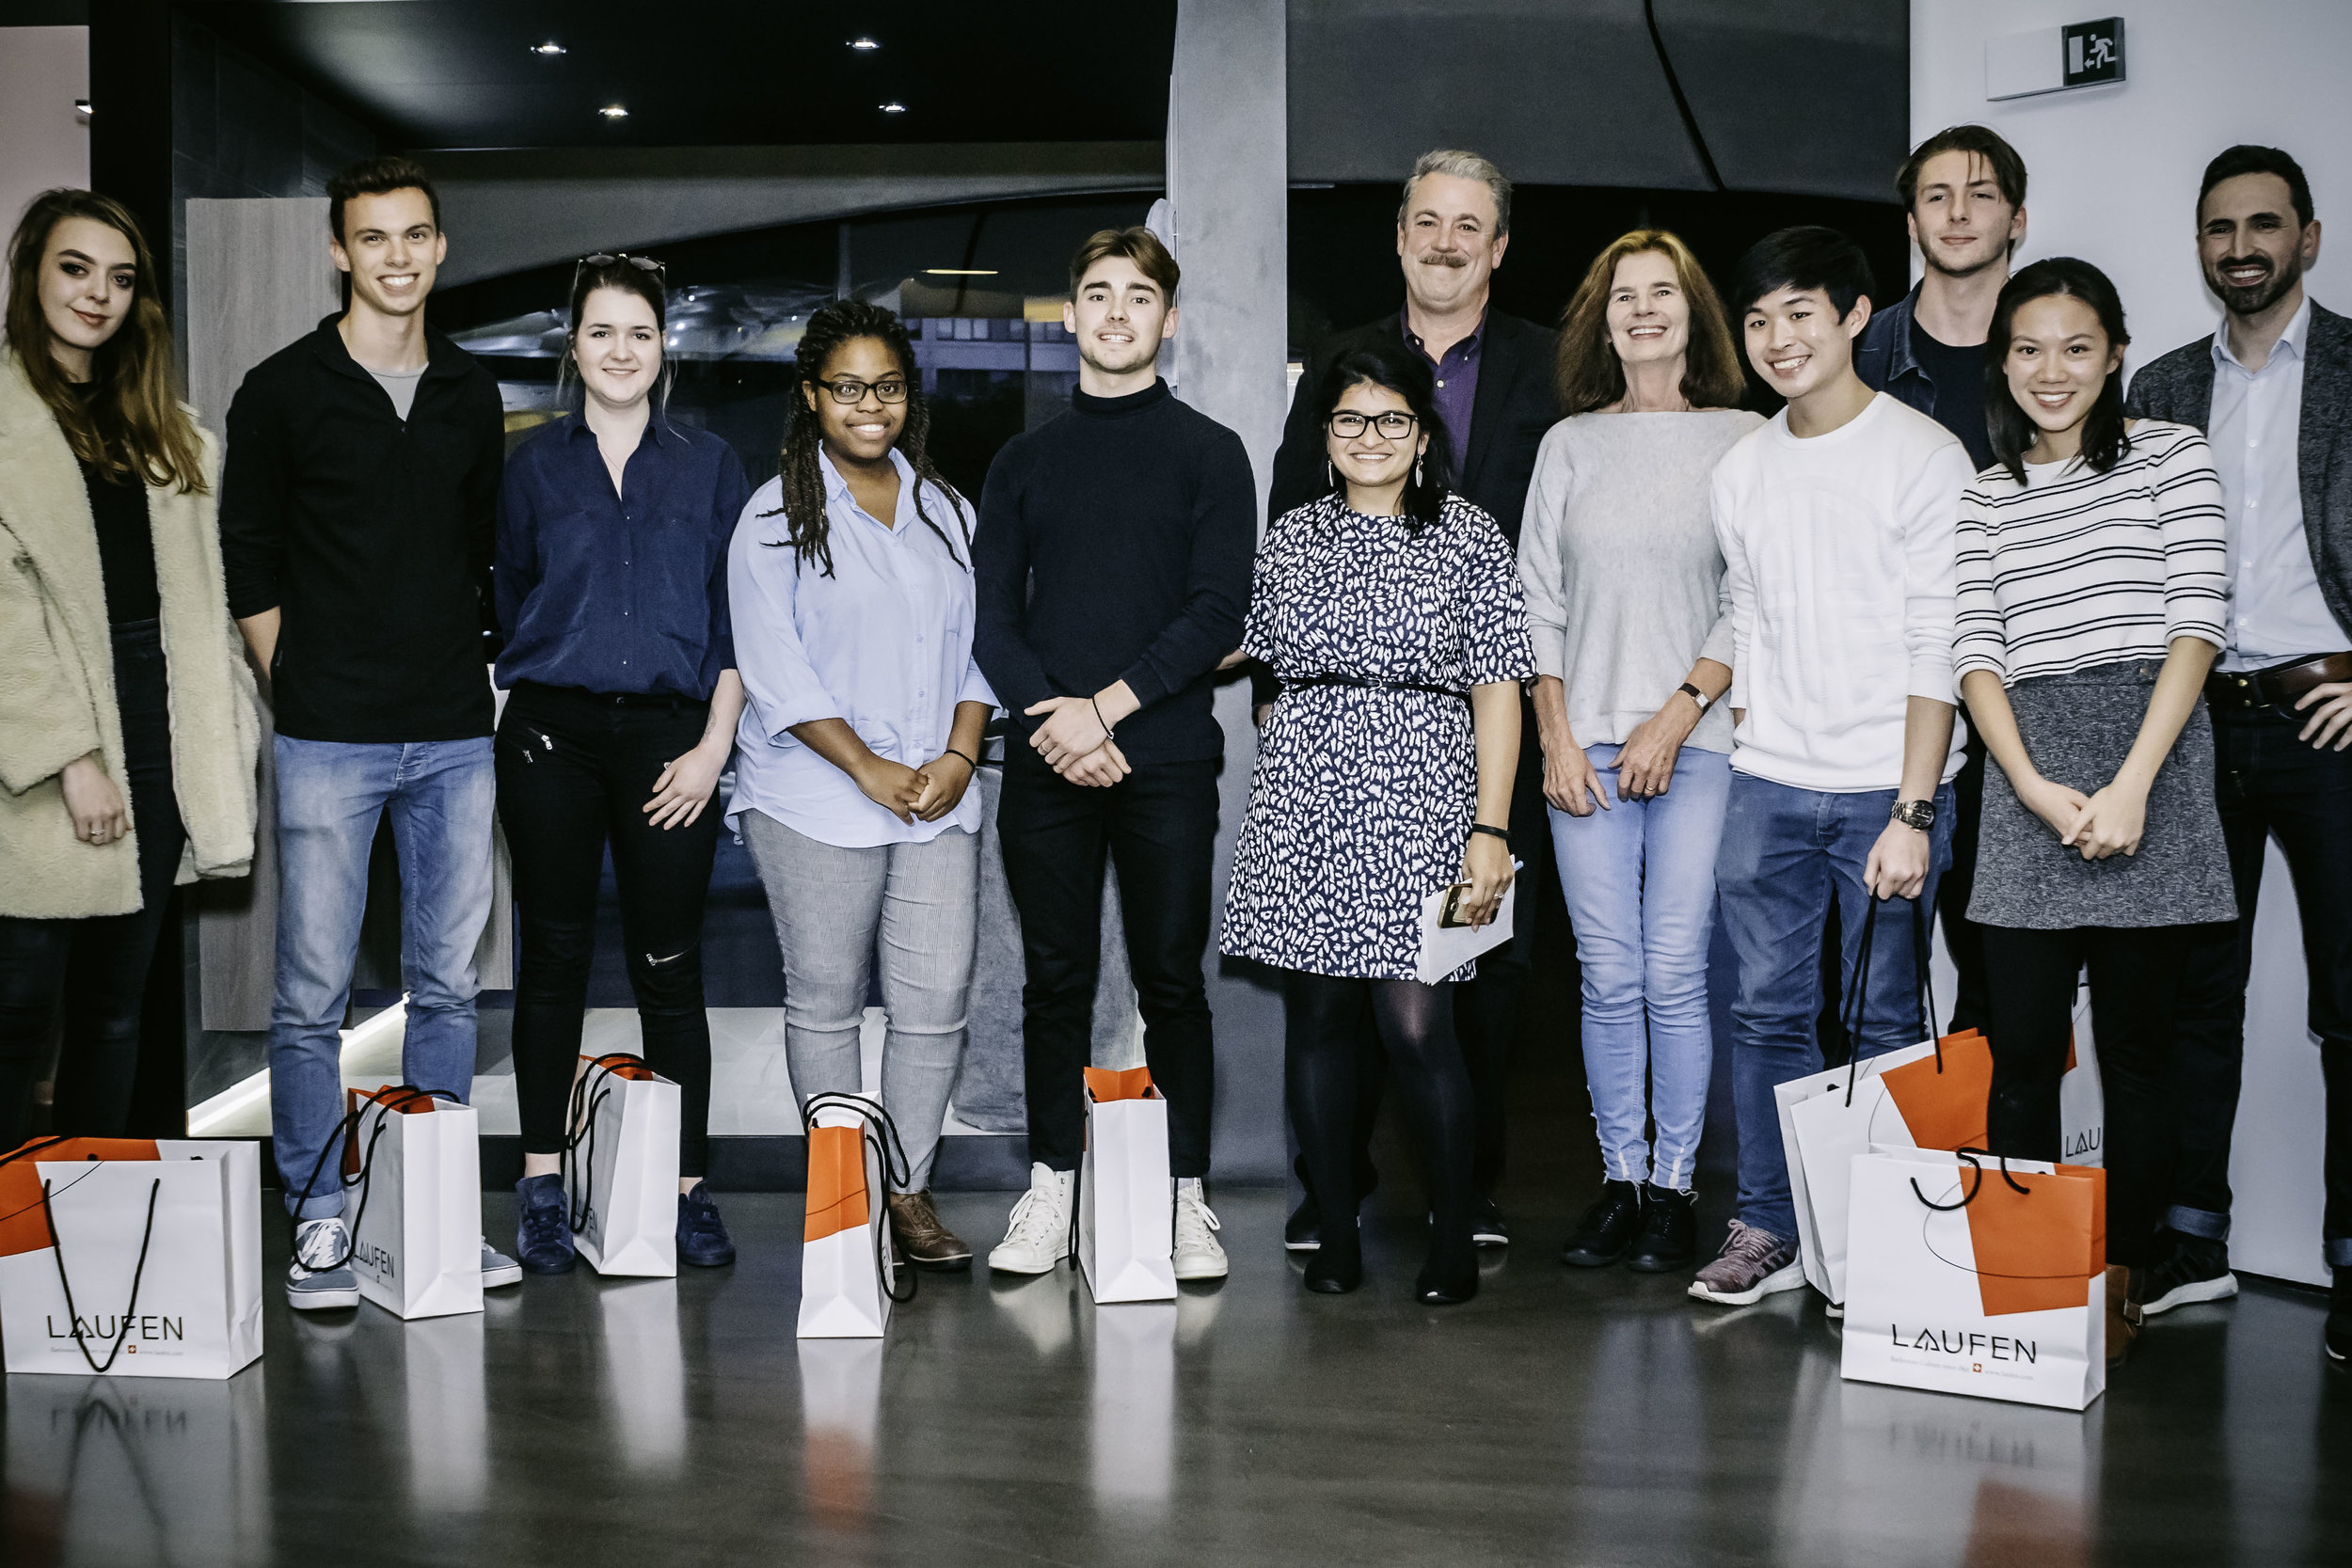 The winning team, University of Kent, their mentor, Bea Sennewald, and the jury, Stephan Reinke, FAIA, David Bromell, and Amrita Raja.